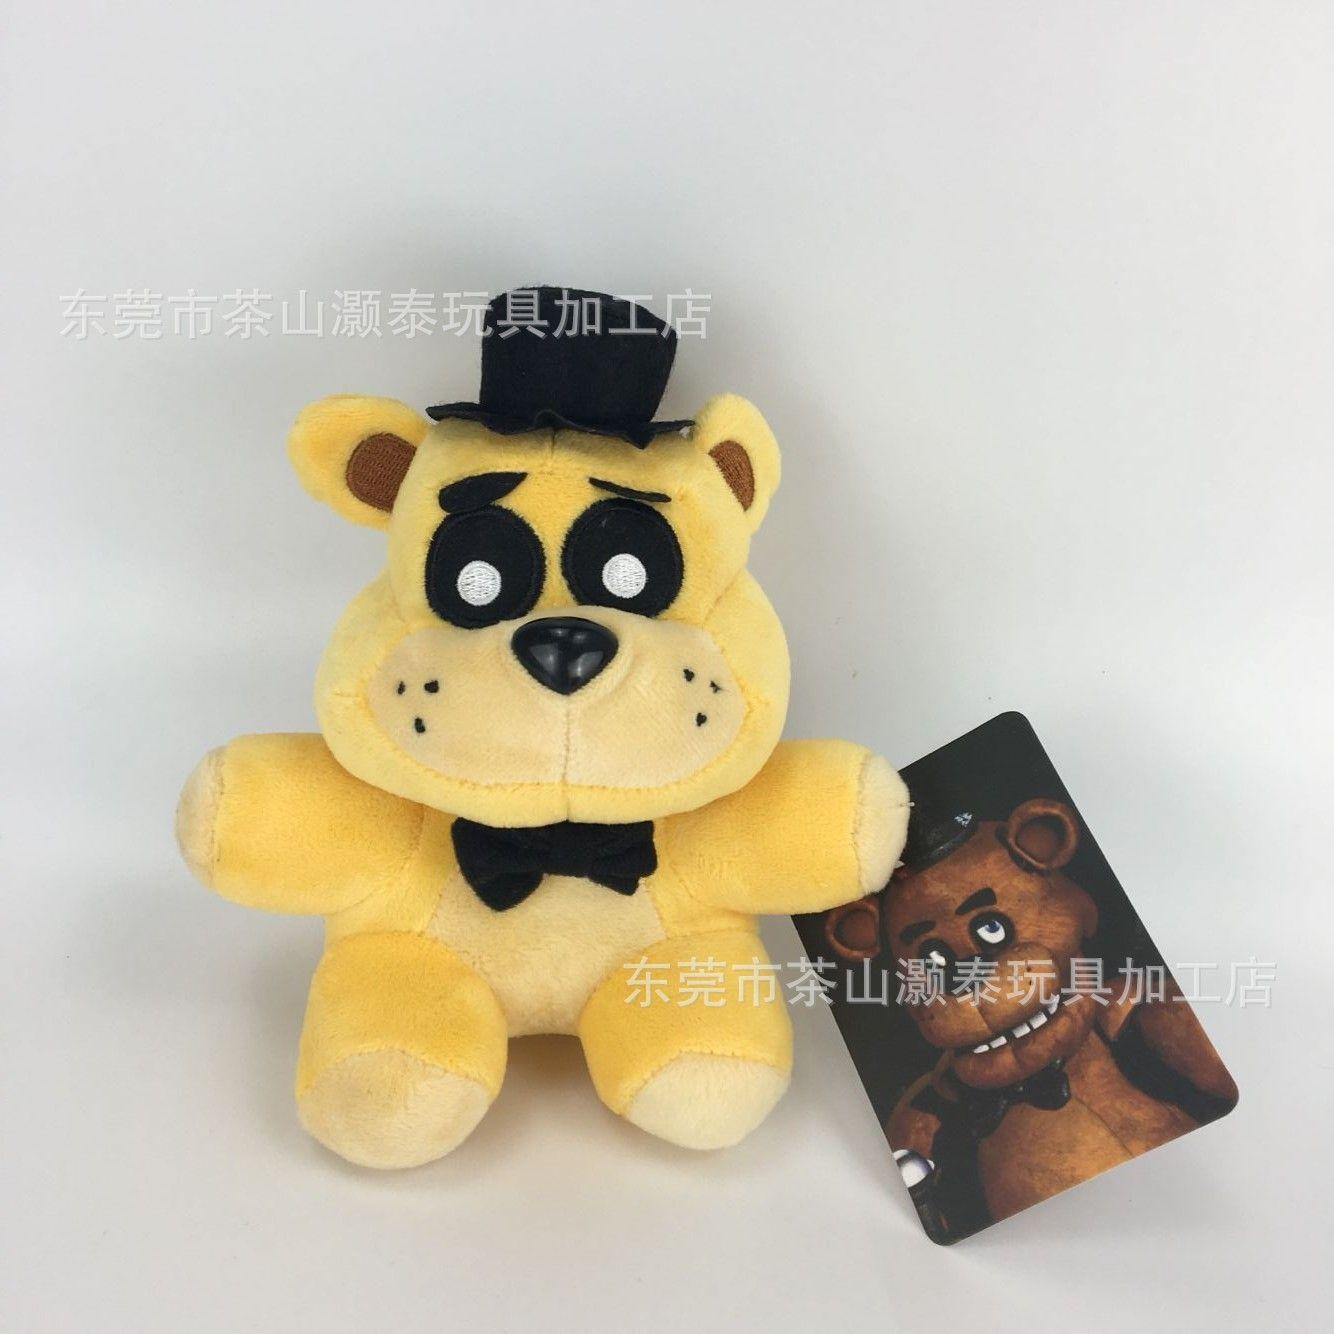 Shoes Hot Selling Teddy Bear Five Nights Harem Midnight Harem Plush Toys Five Fredys Doll Cartoon Children